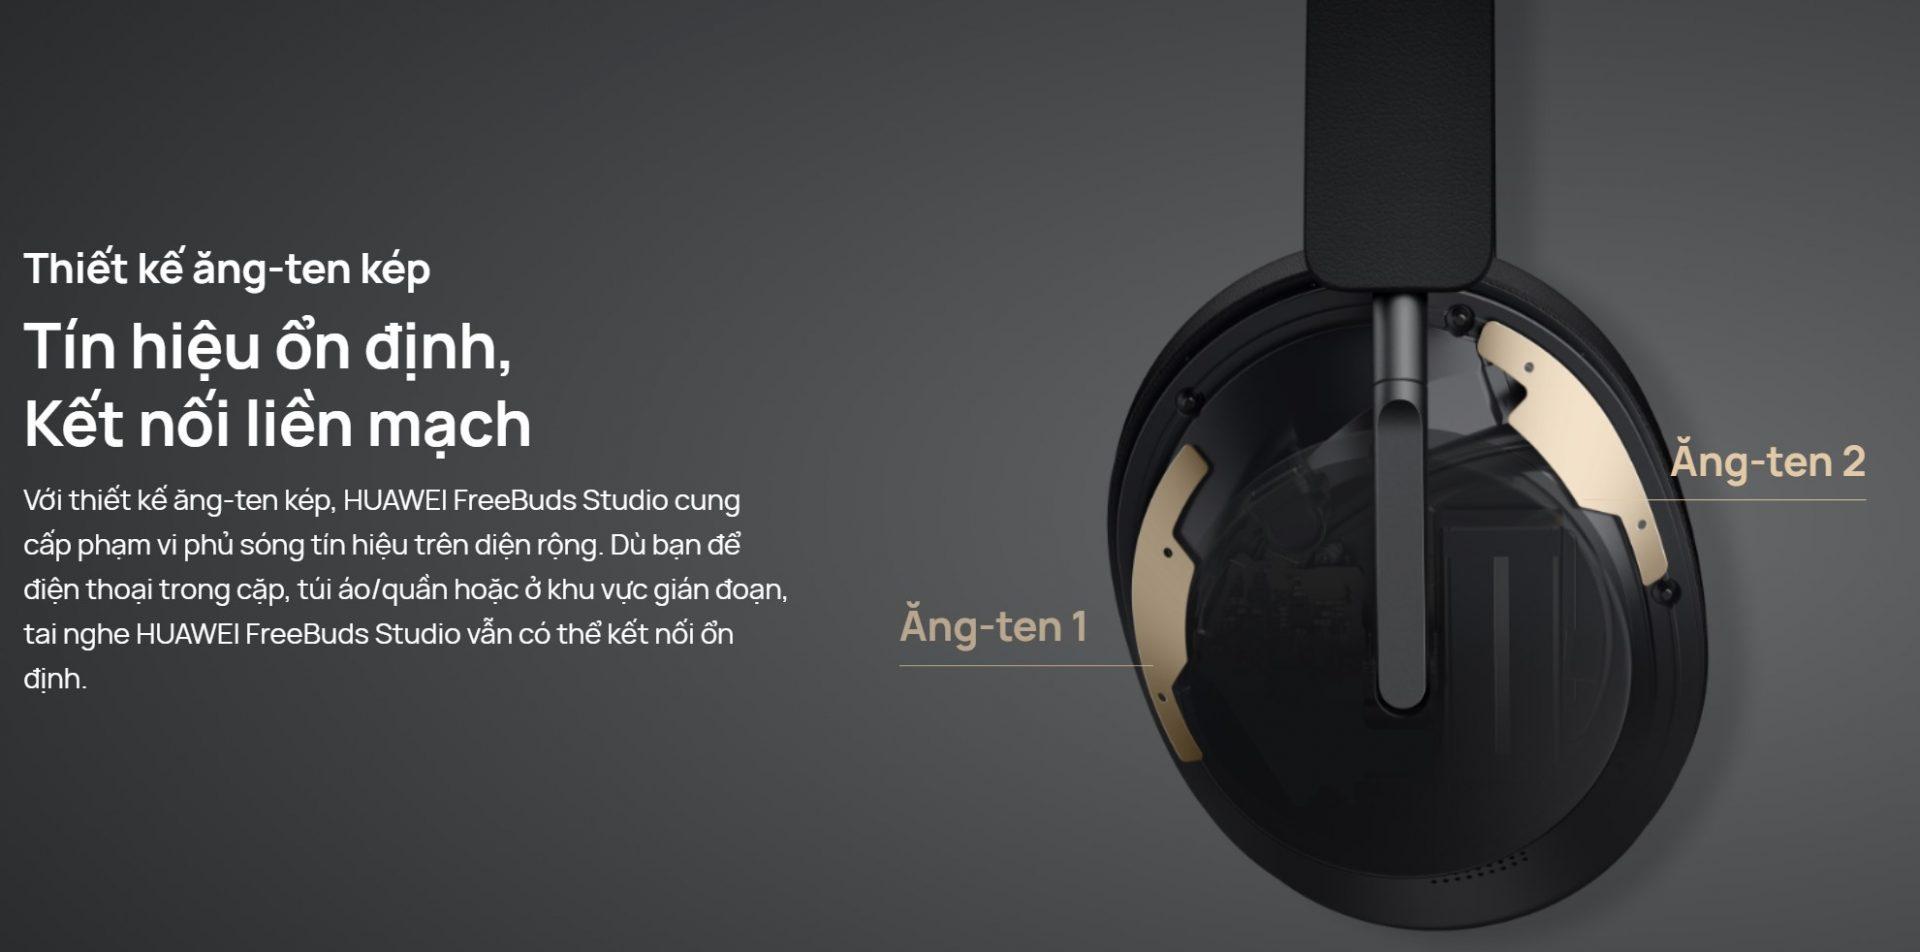 Tai nghe Huawei FreeBuds Studio 13